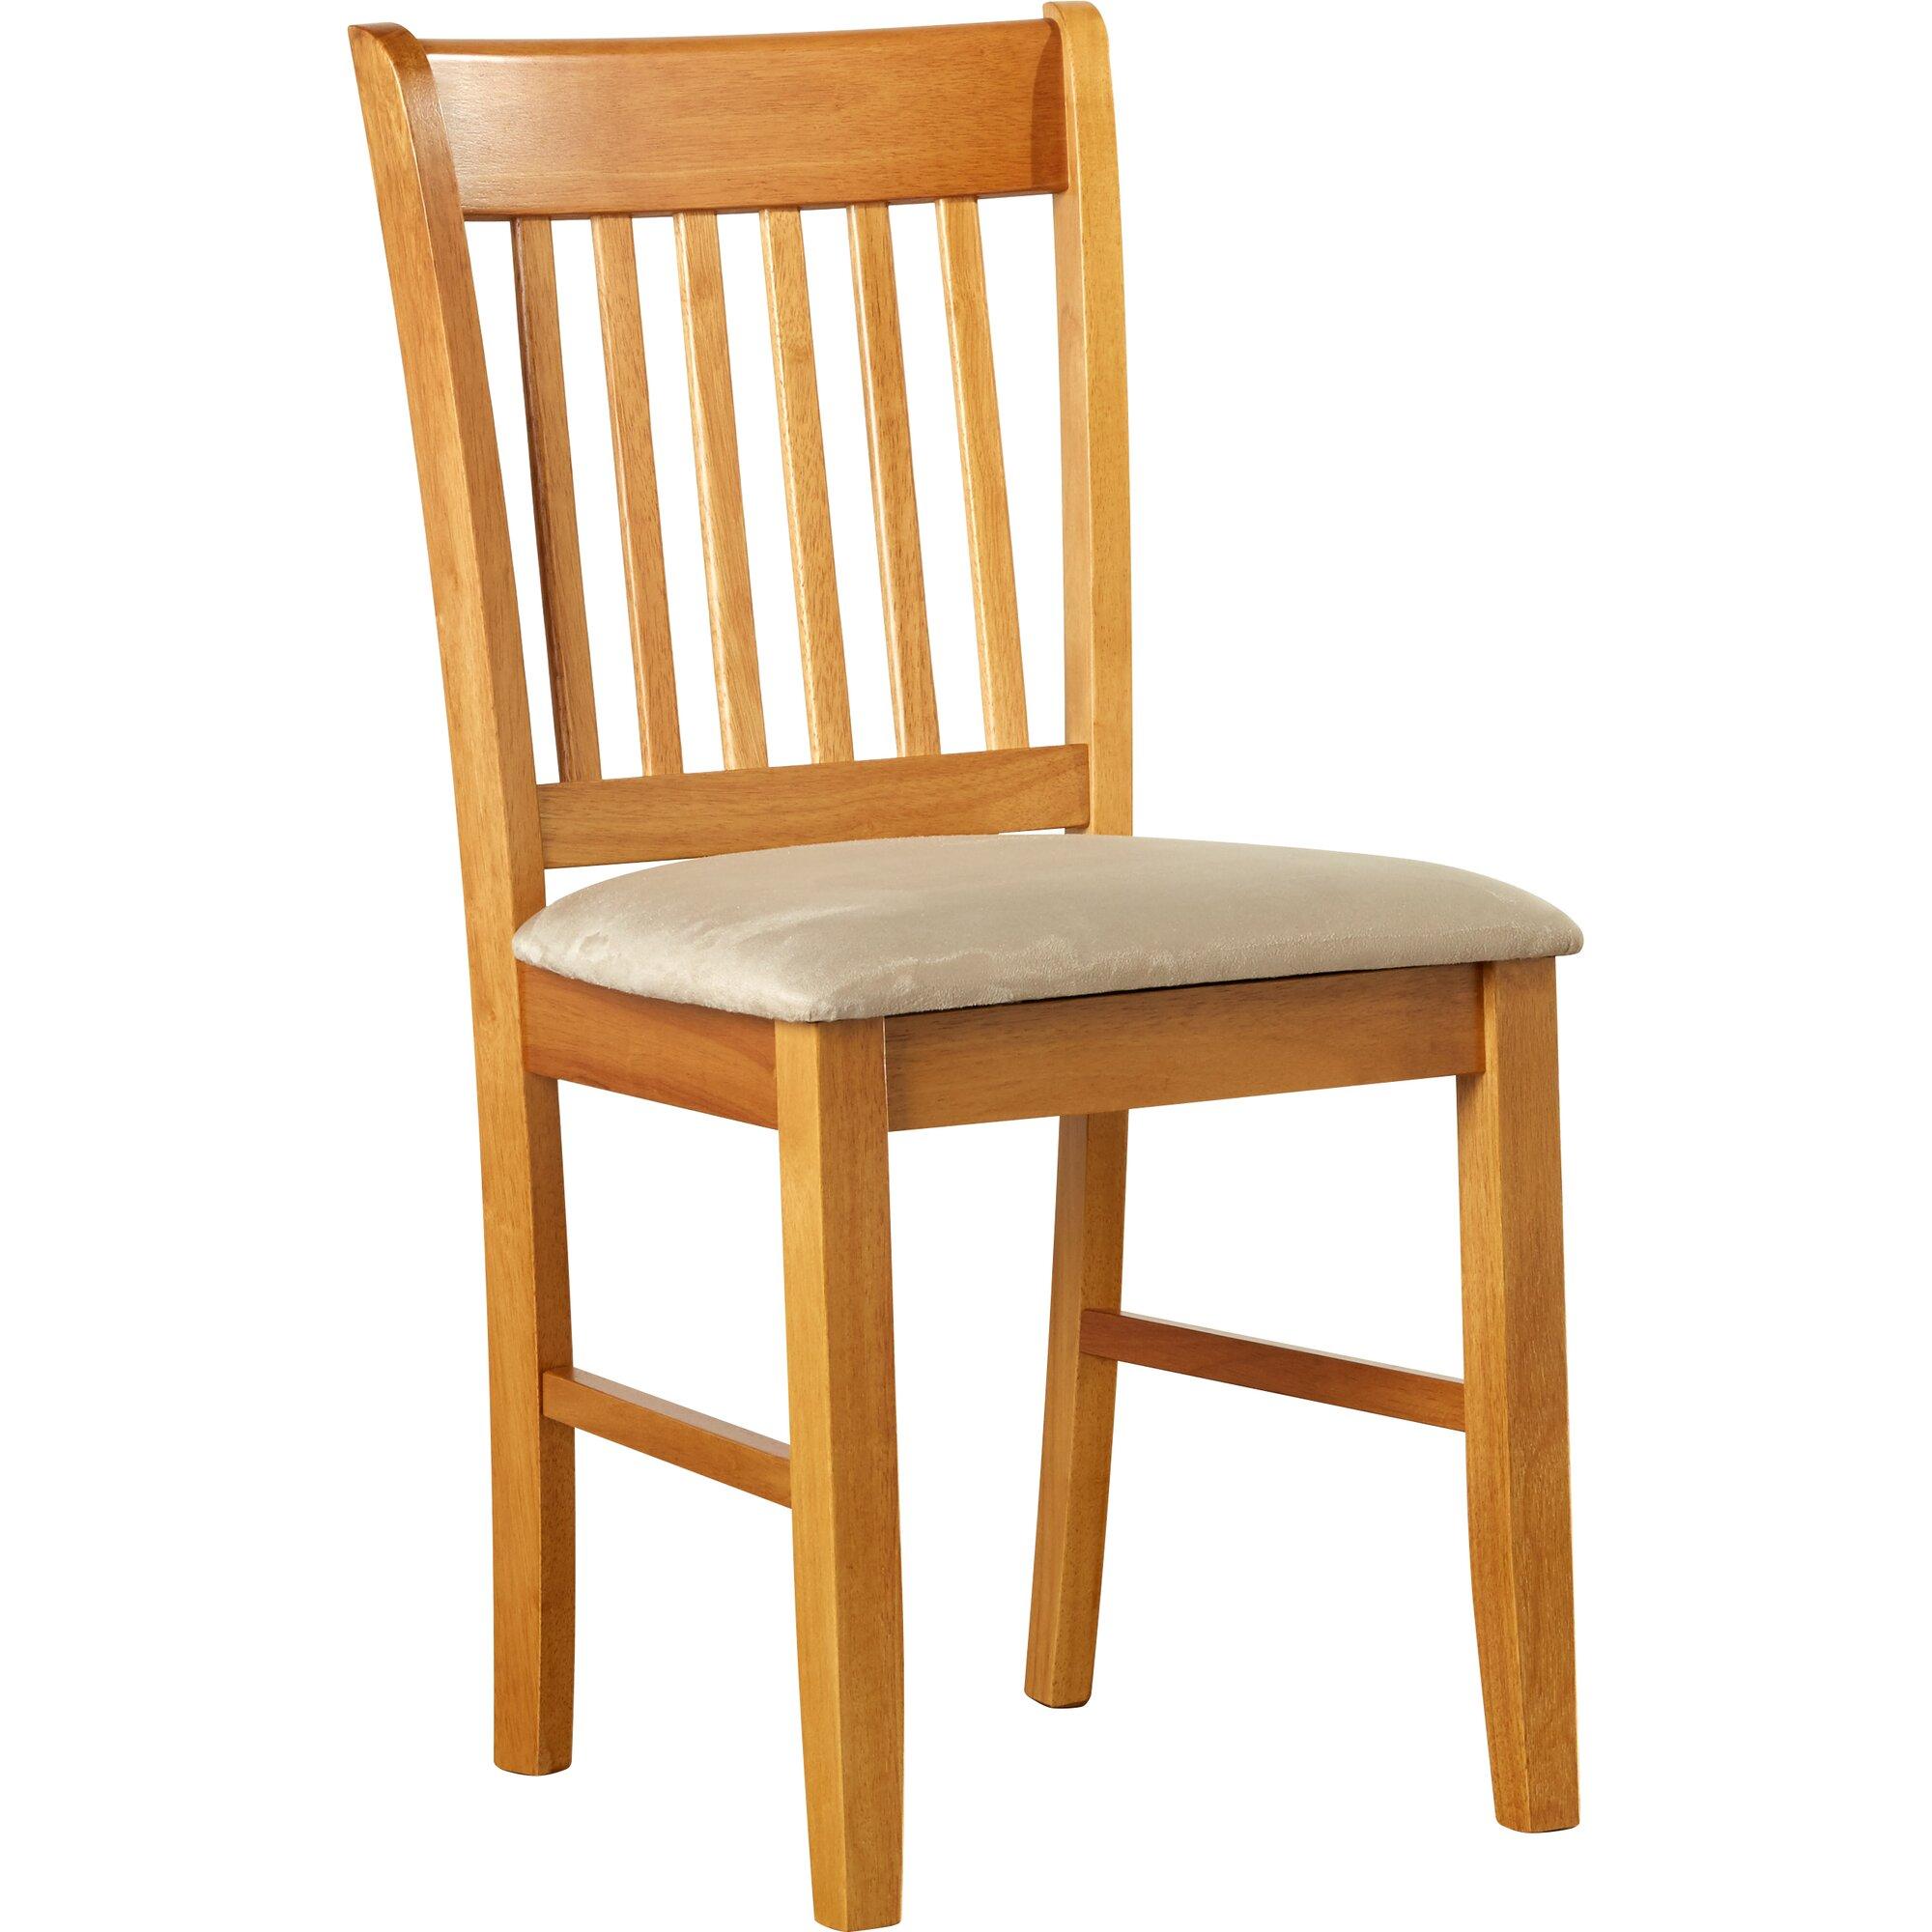 Three Posts Lincklaen Extendable Dining Set with 4 Chairs  : LincklaenExtendableDiningSetwith4Chairs from www.wayfair.co.uk size 2000 x 2000 jpeg 236kB